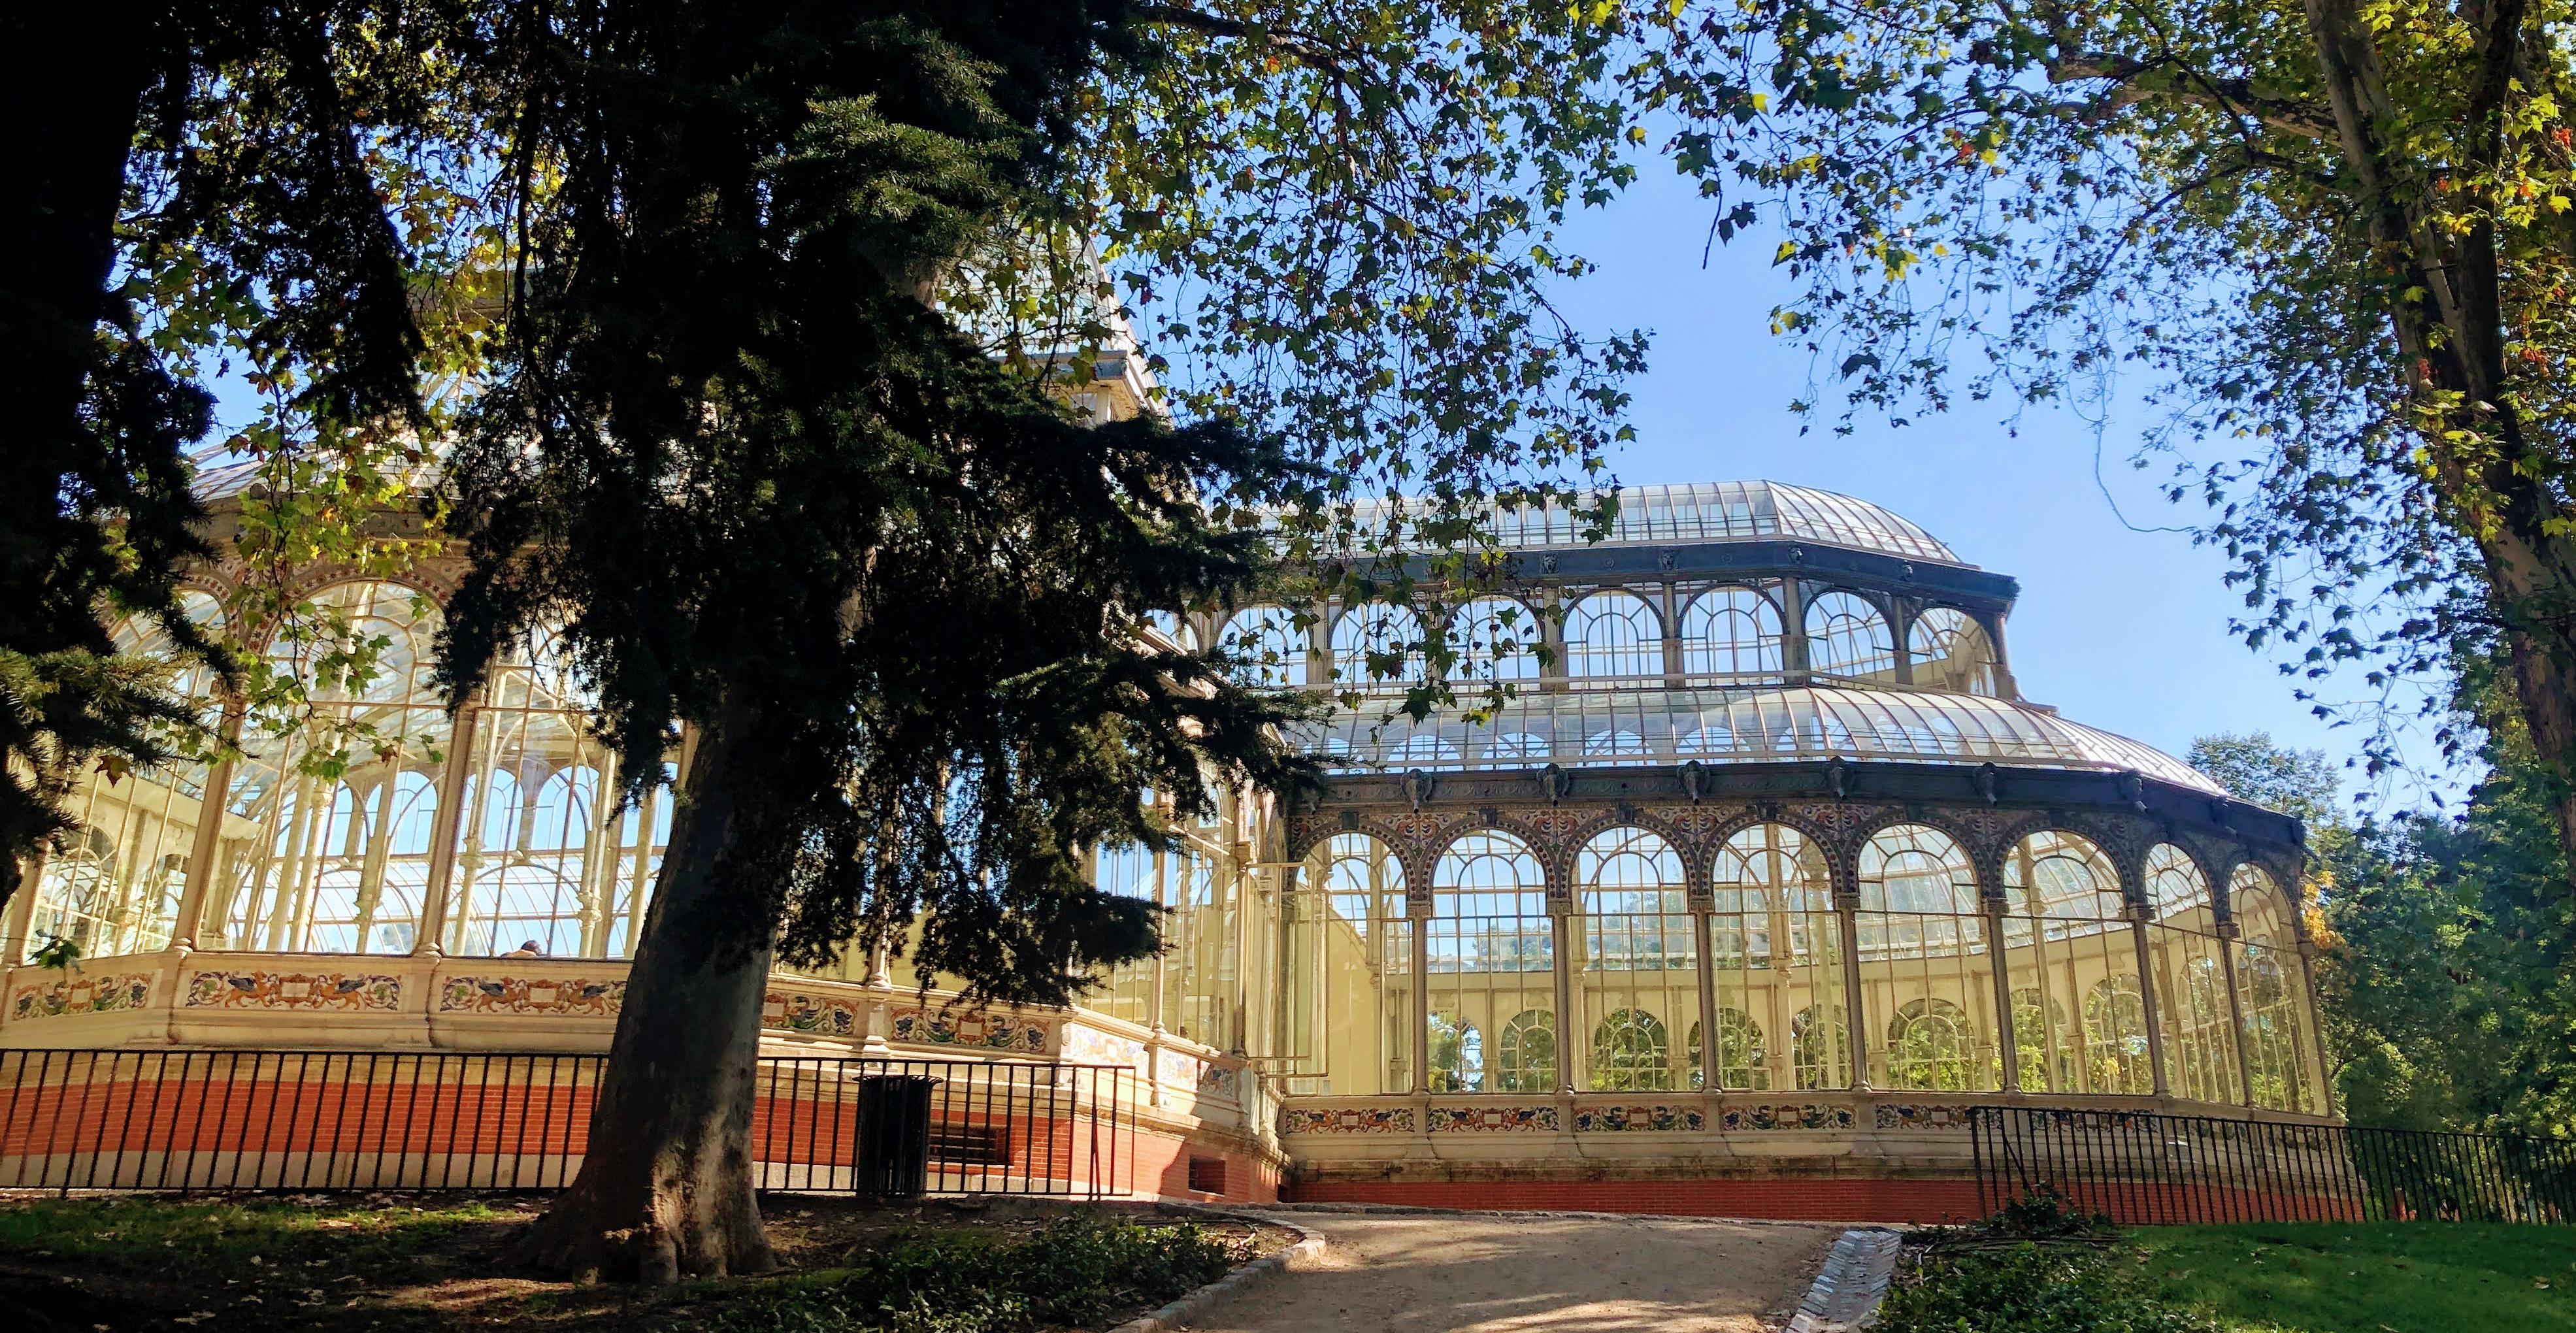 palace made of glass